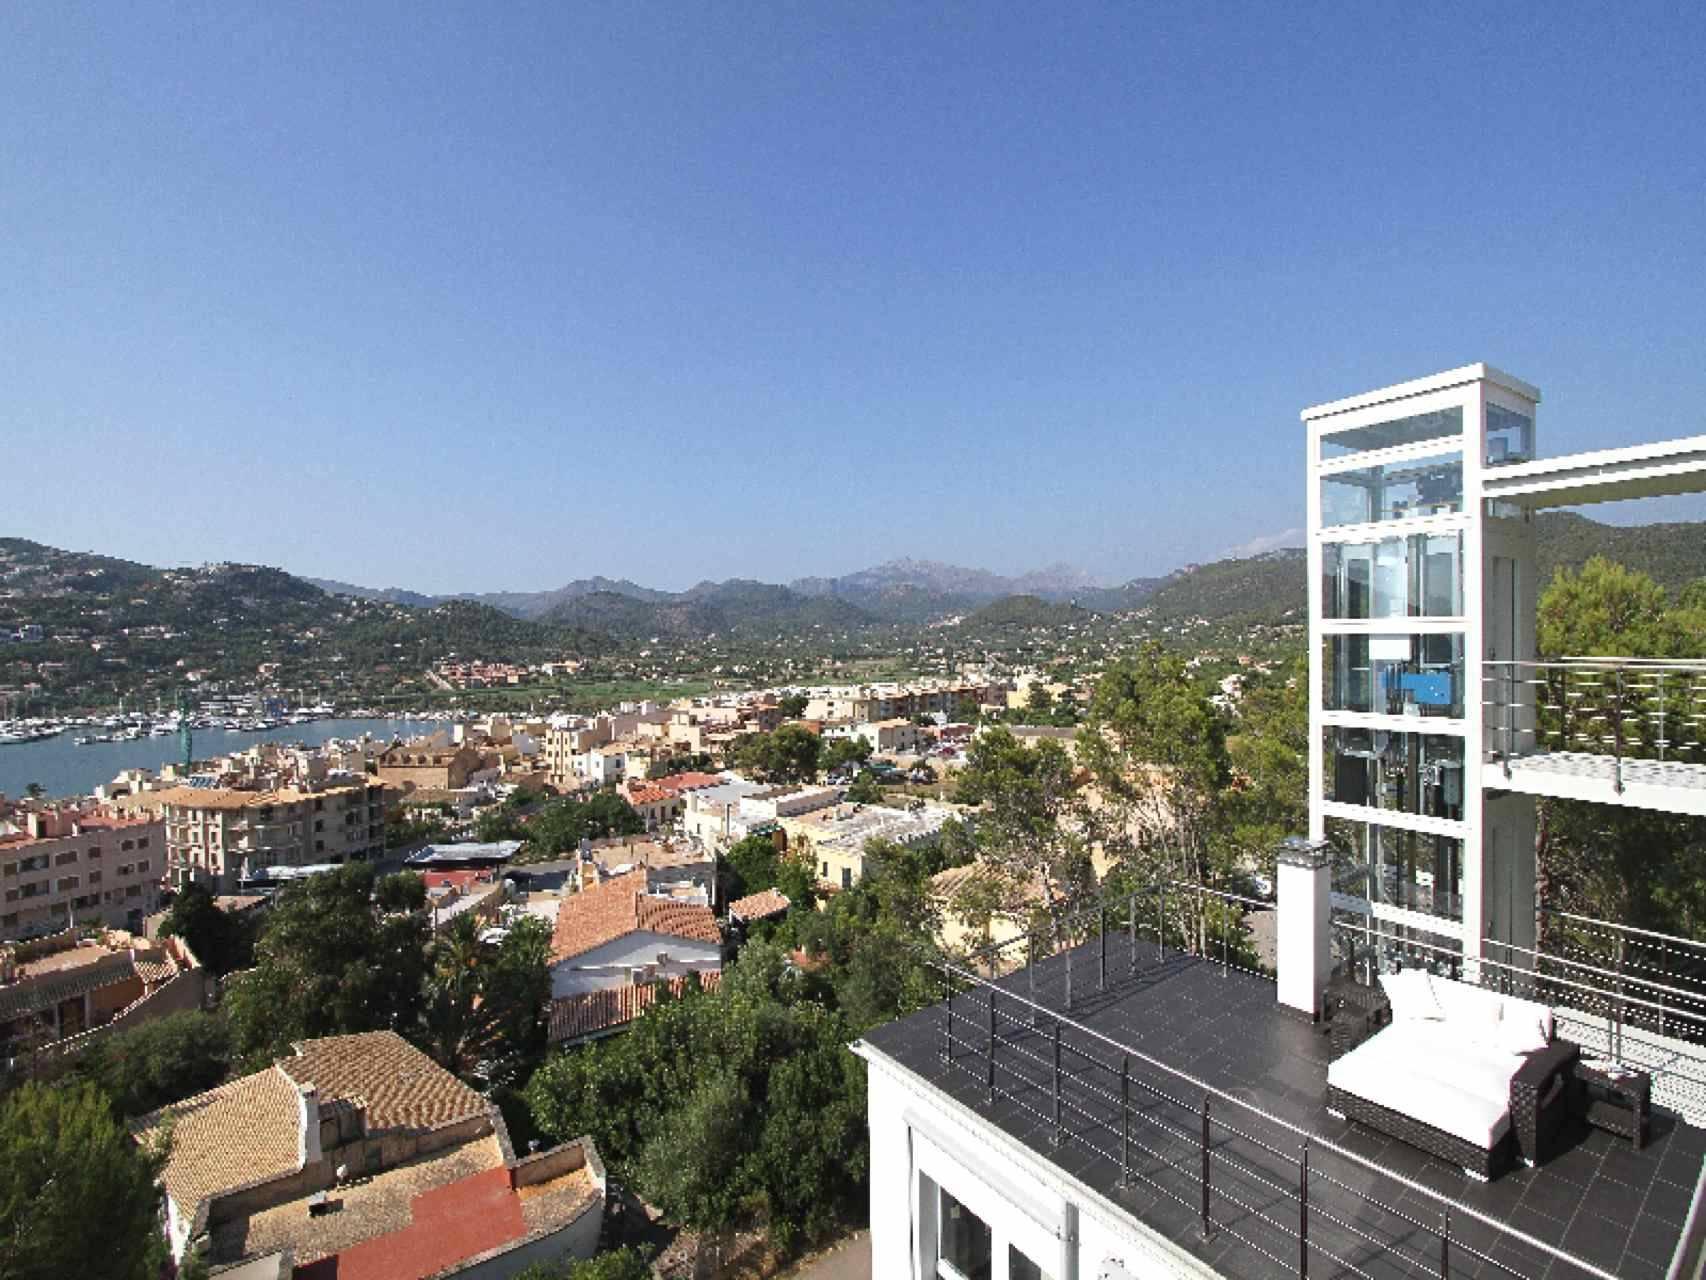 01-04 Bauhaus Villa Mallorca Südwesten Bild 15